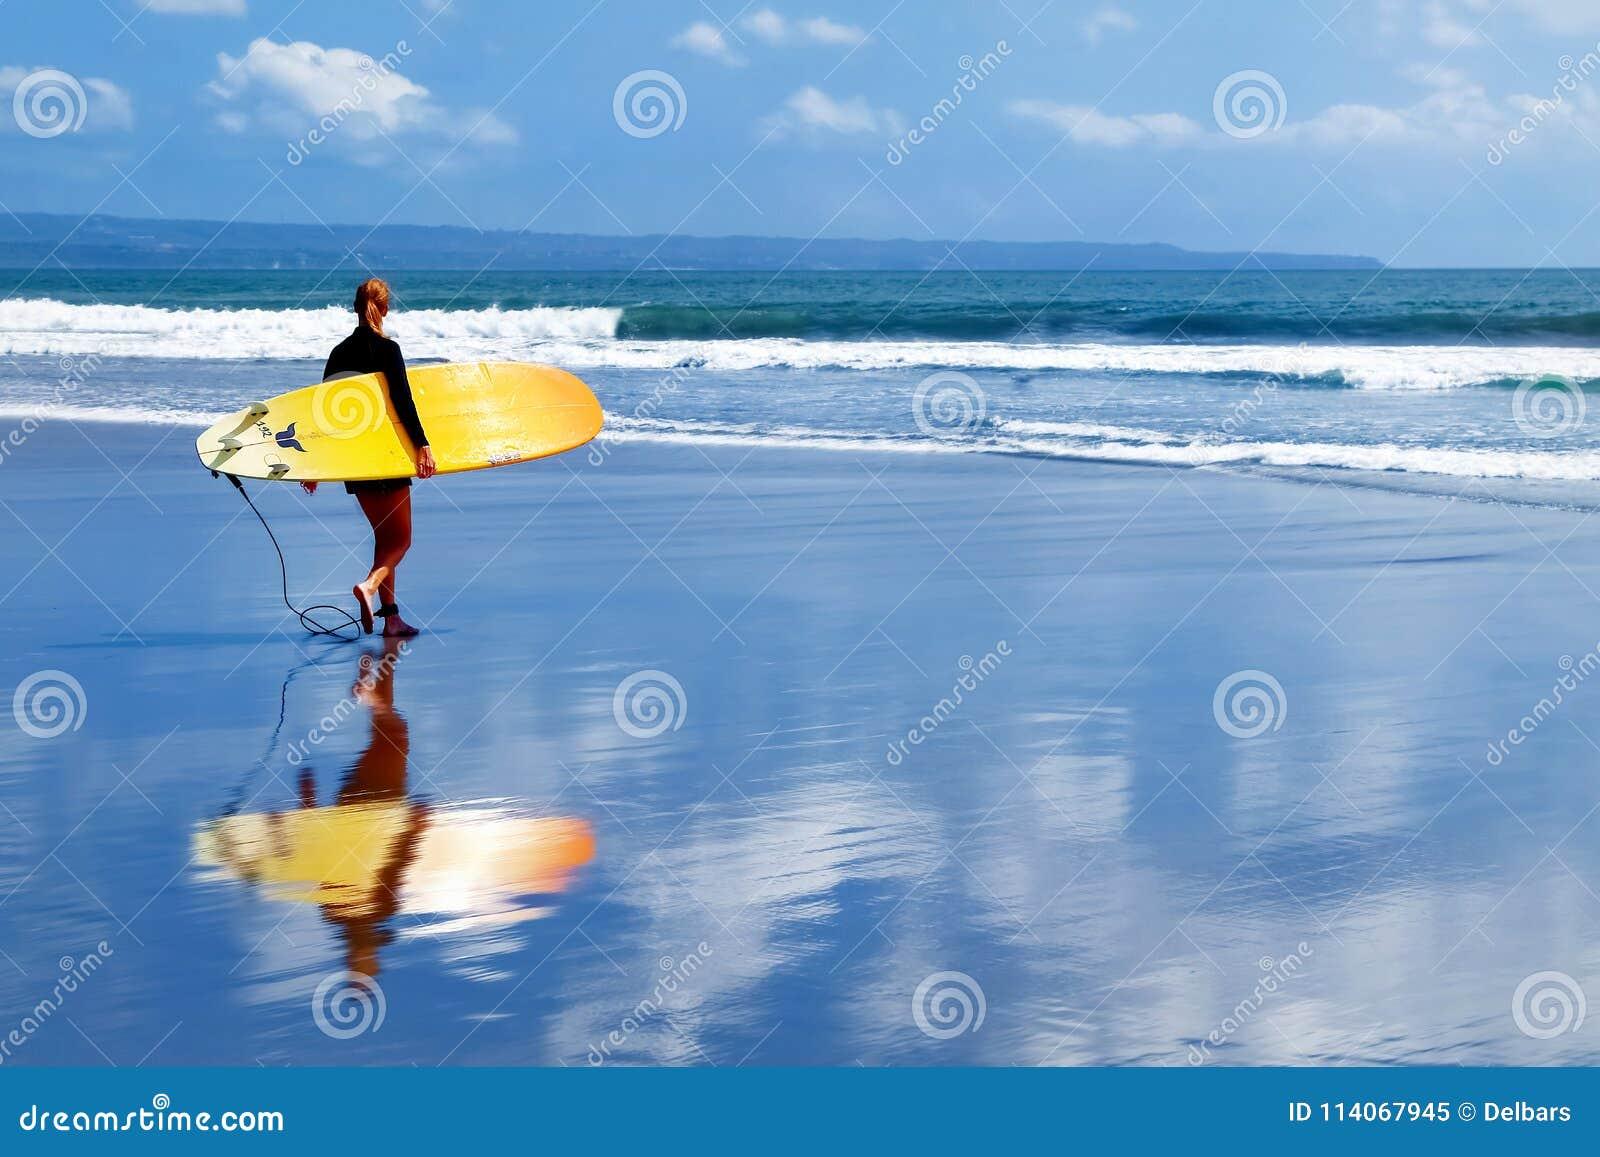 Indonesia, Bali Island, Kuta - October 10, 2017: Girl Surfer